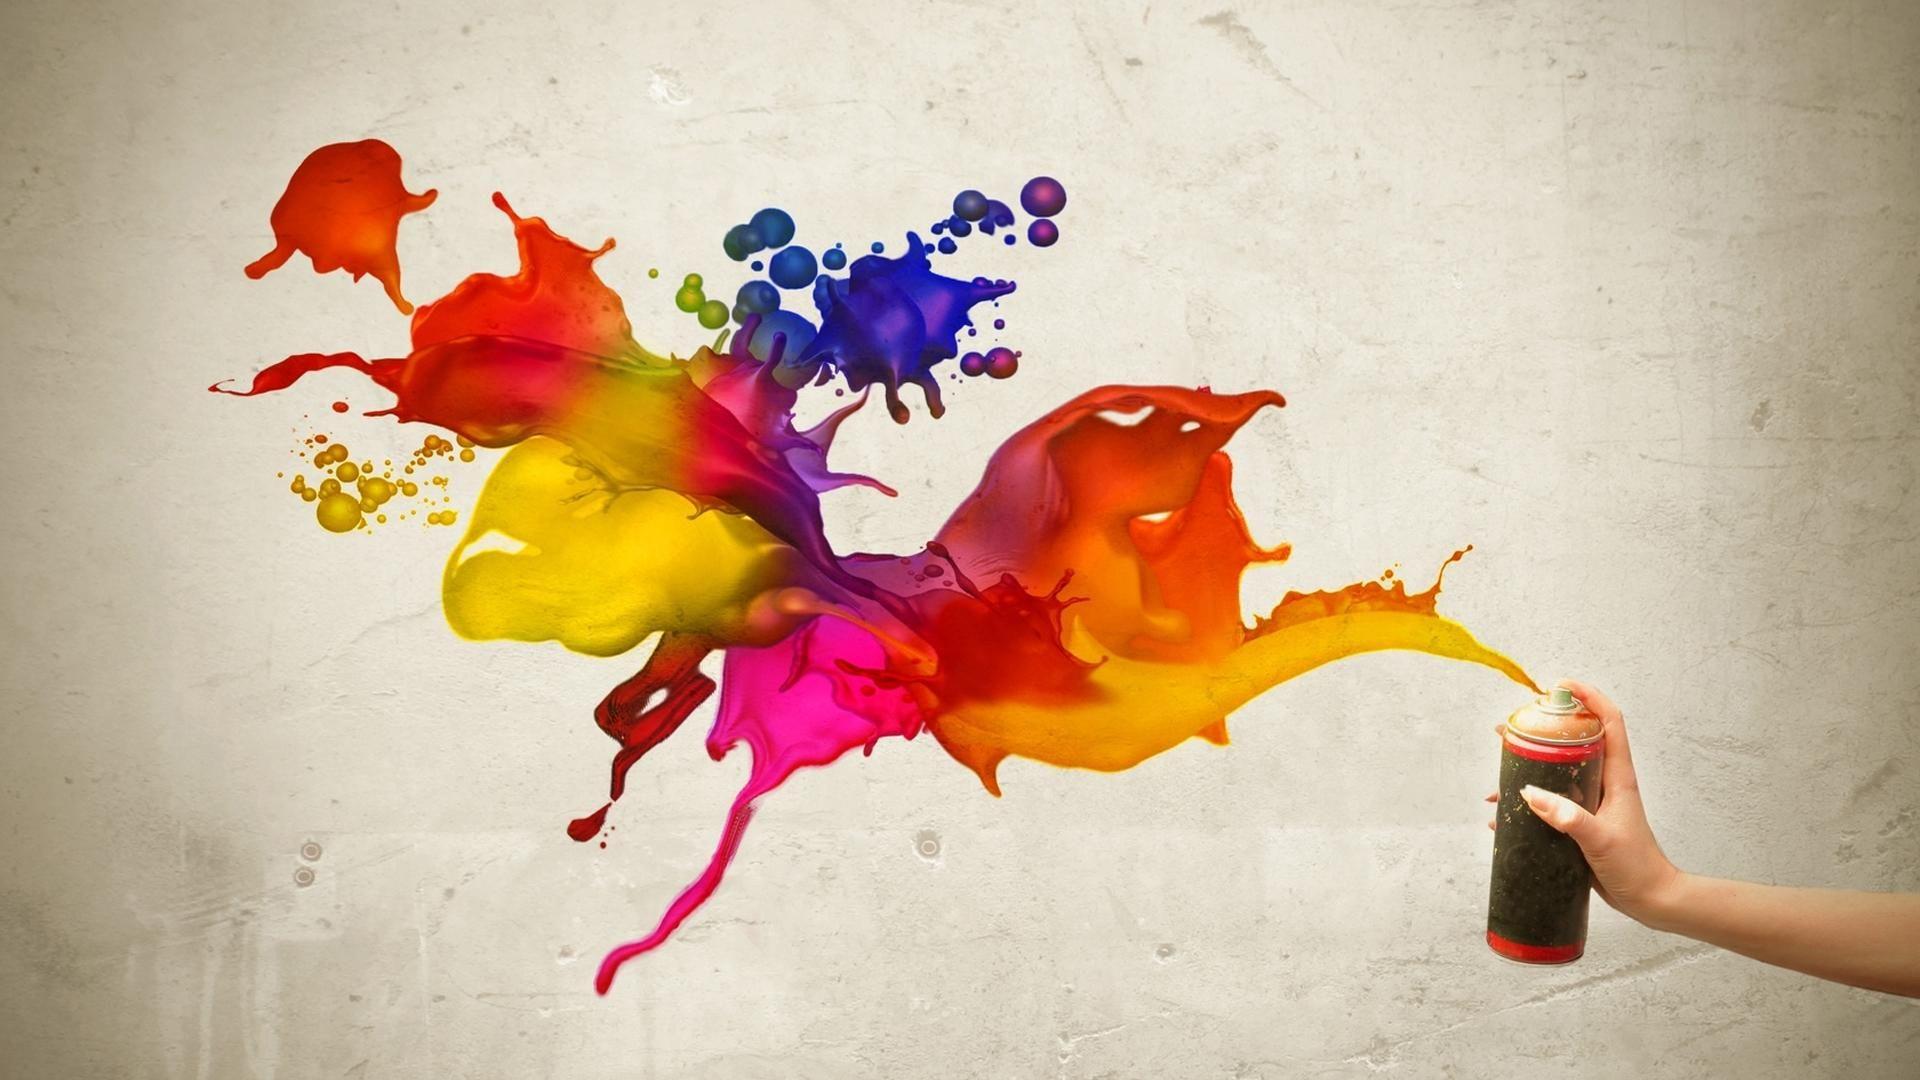 Graphic Design wallpaper free